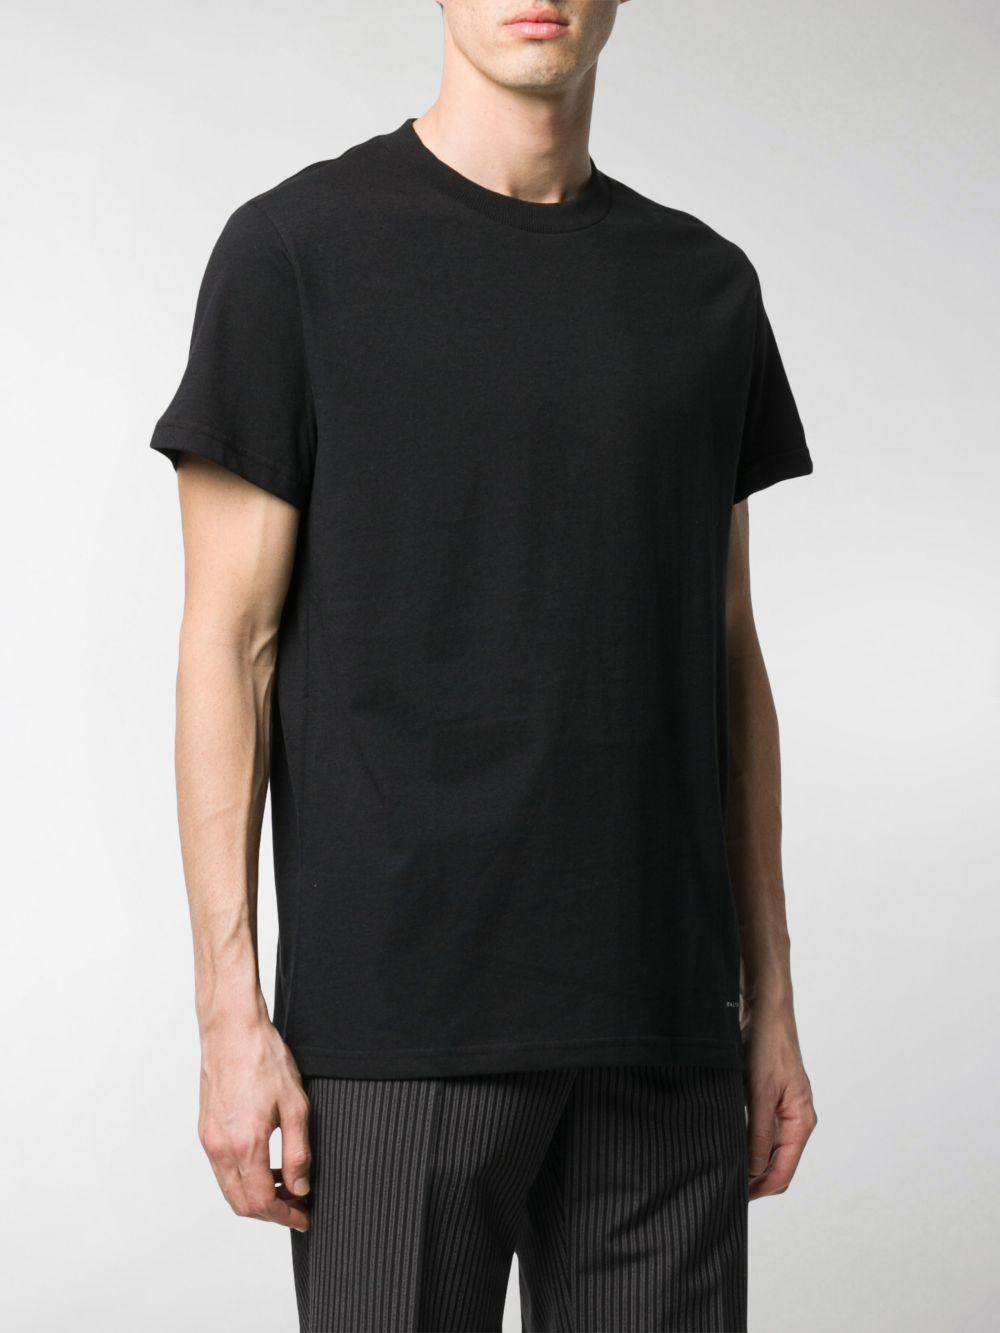 1017 Alyx 9sm tripack t-shirt unisex multicolor 1017 ALYX 9SM | T-shirts | AVUTS0024FA01MTY00